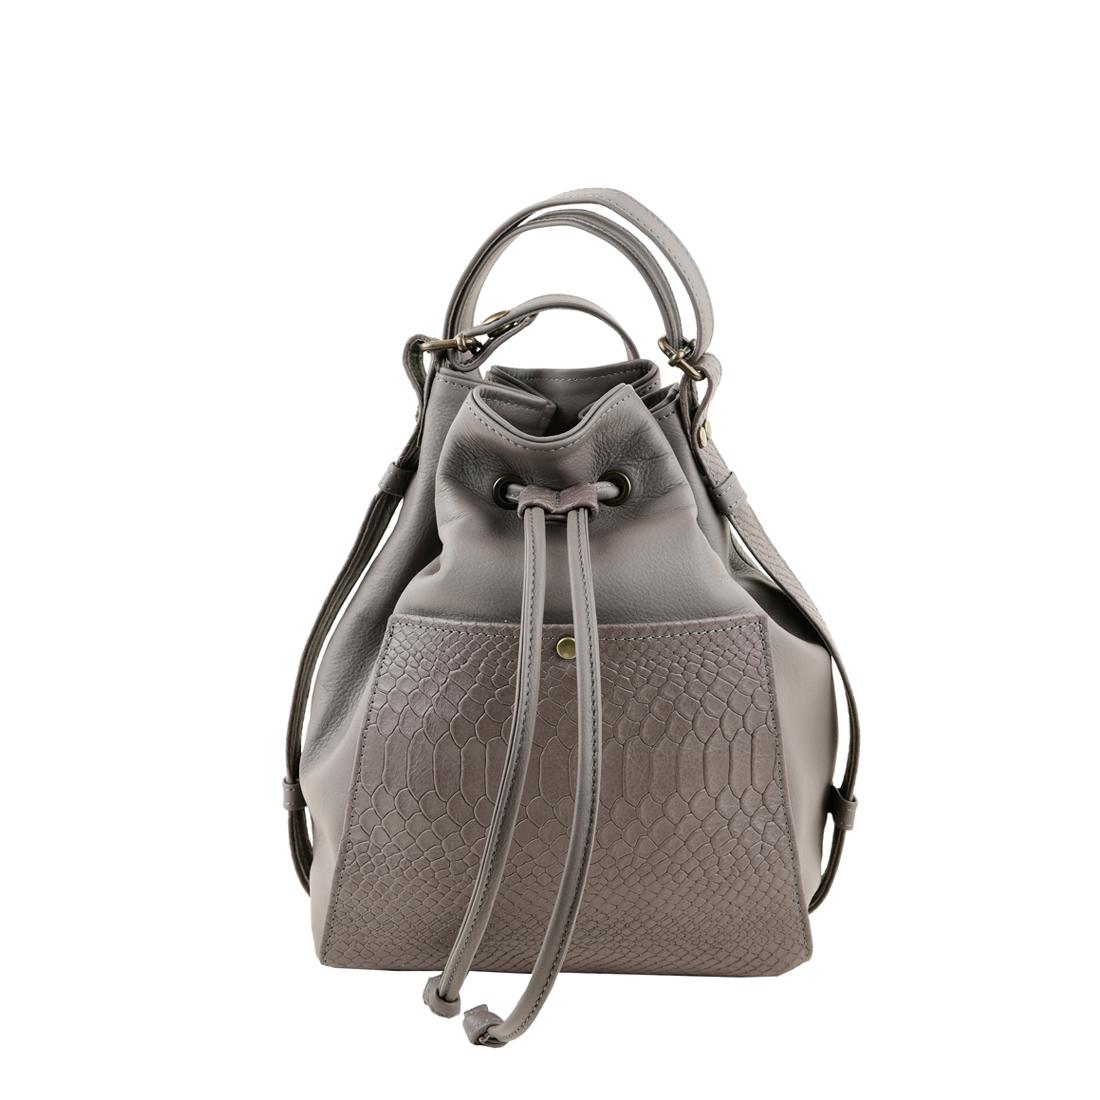 Jenny grigio across body leather bag